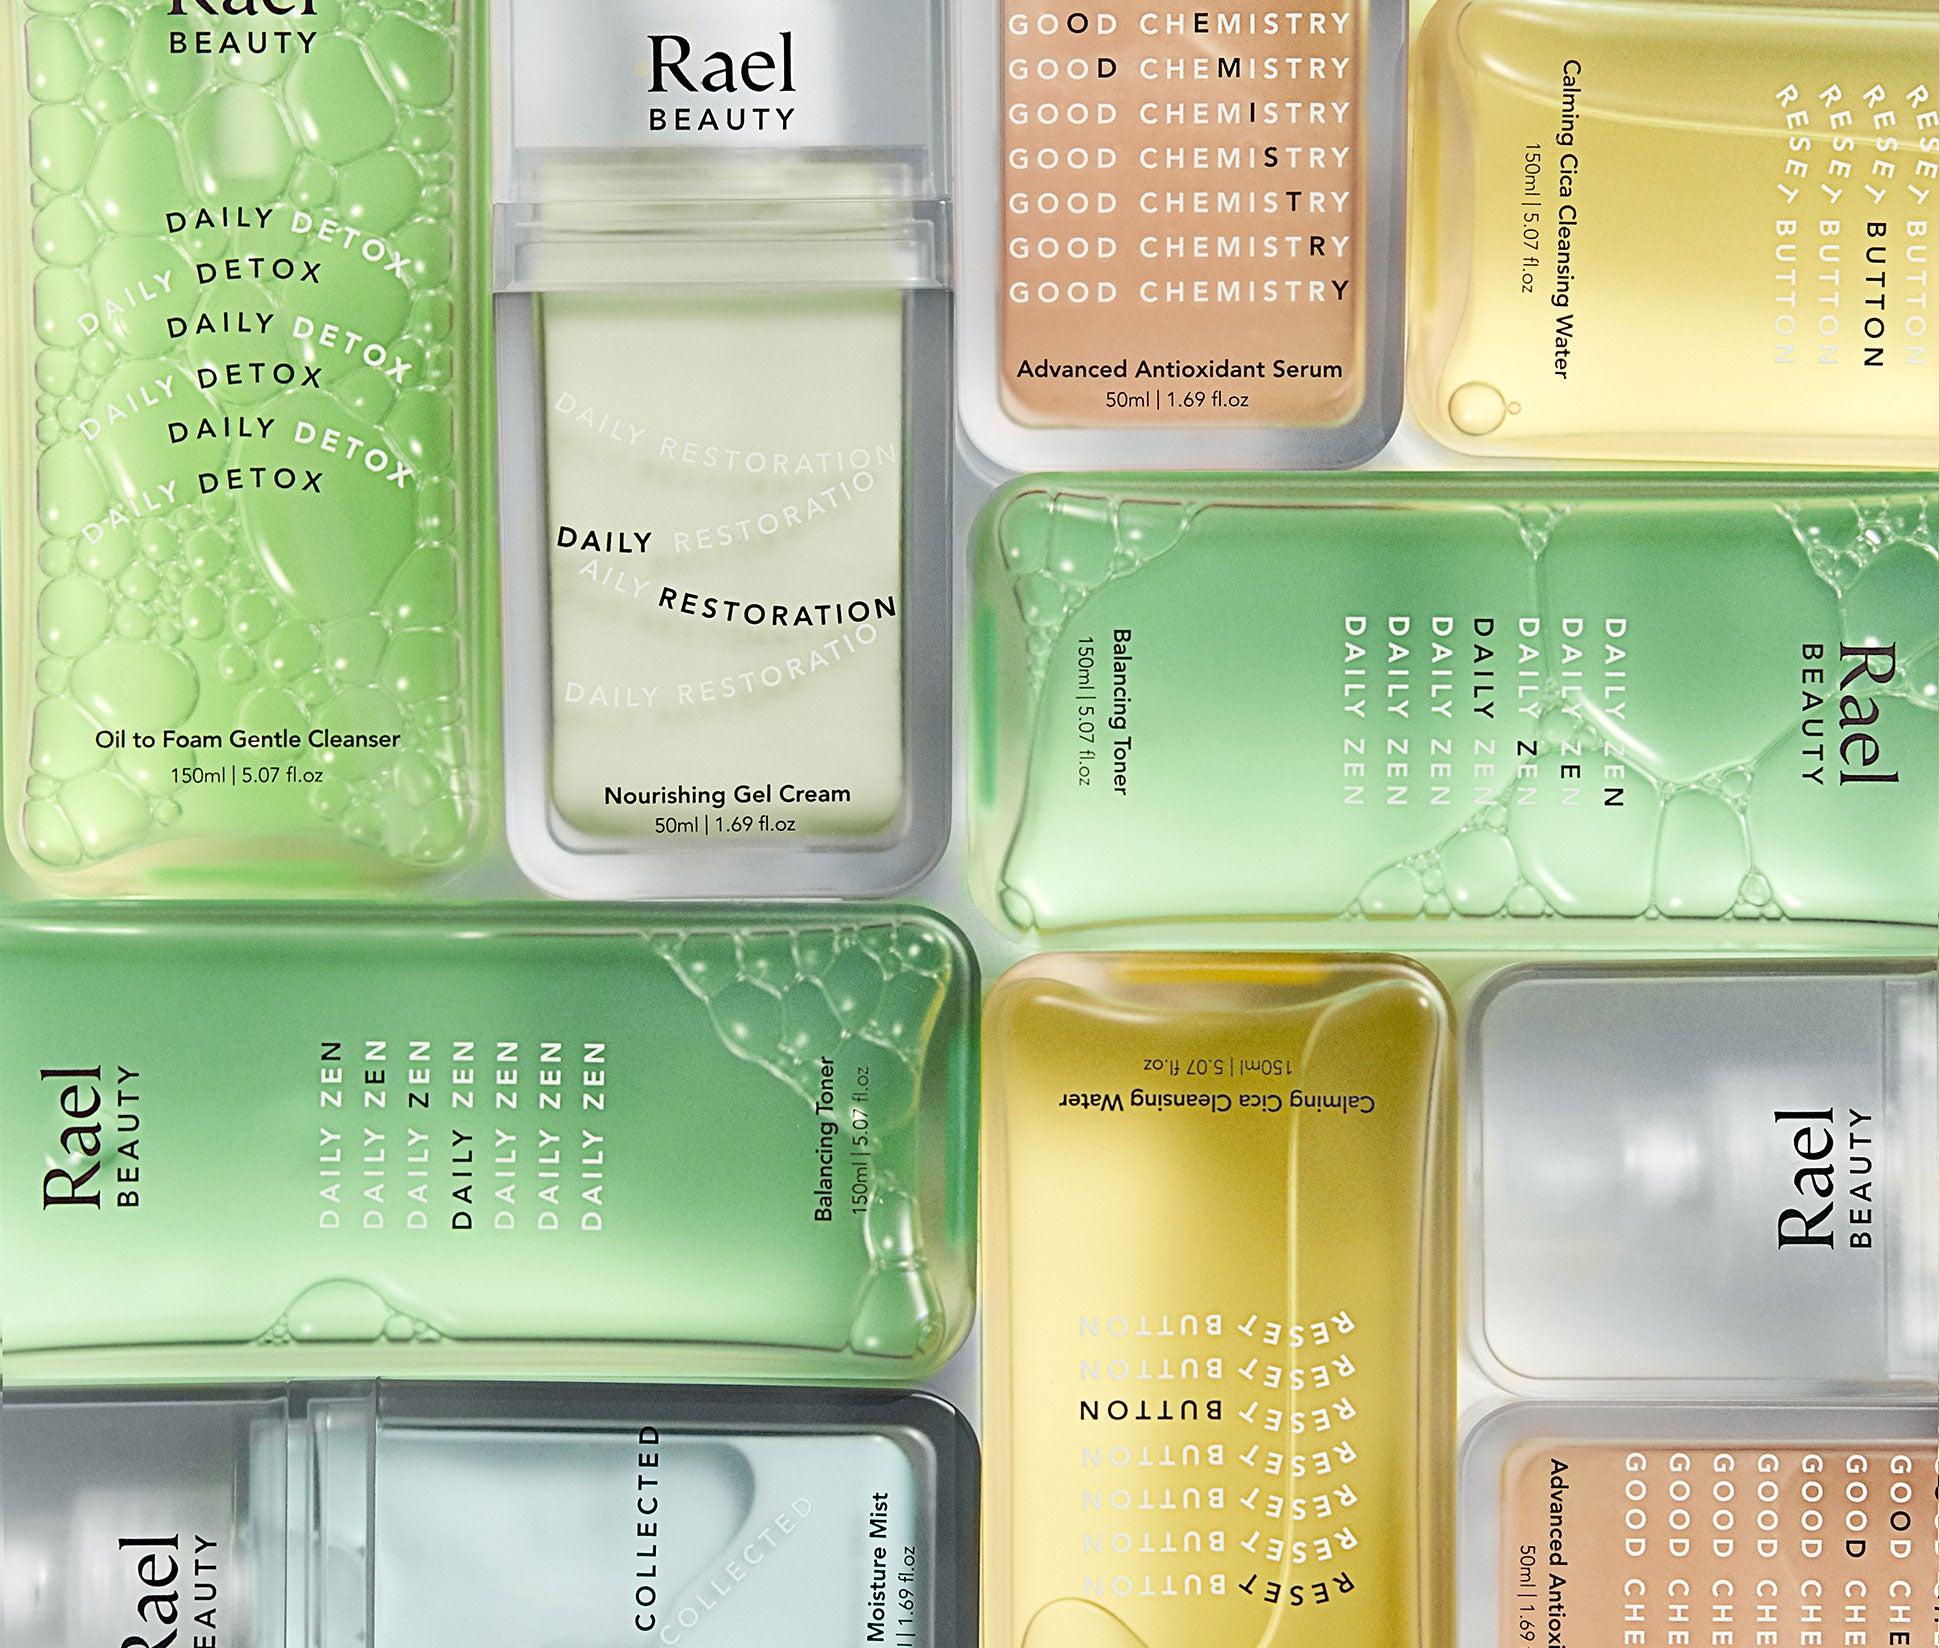 Rael - Daily Restoration Nourishing Gel Cream